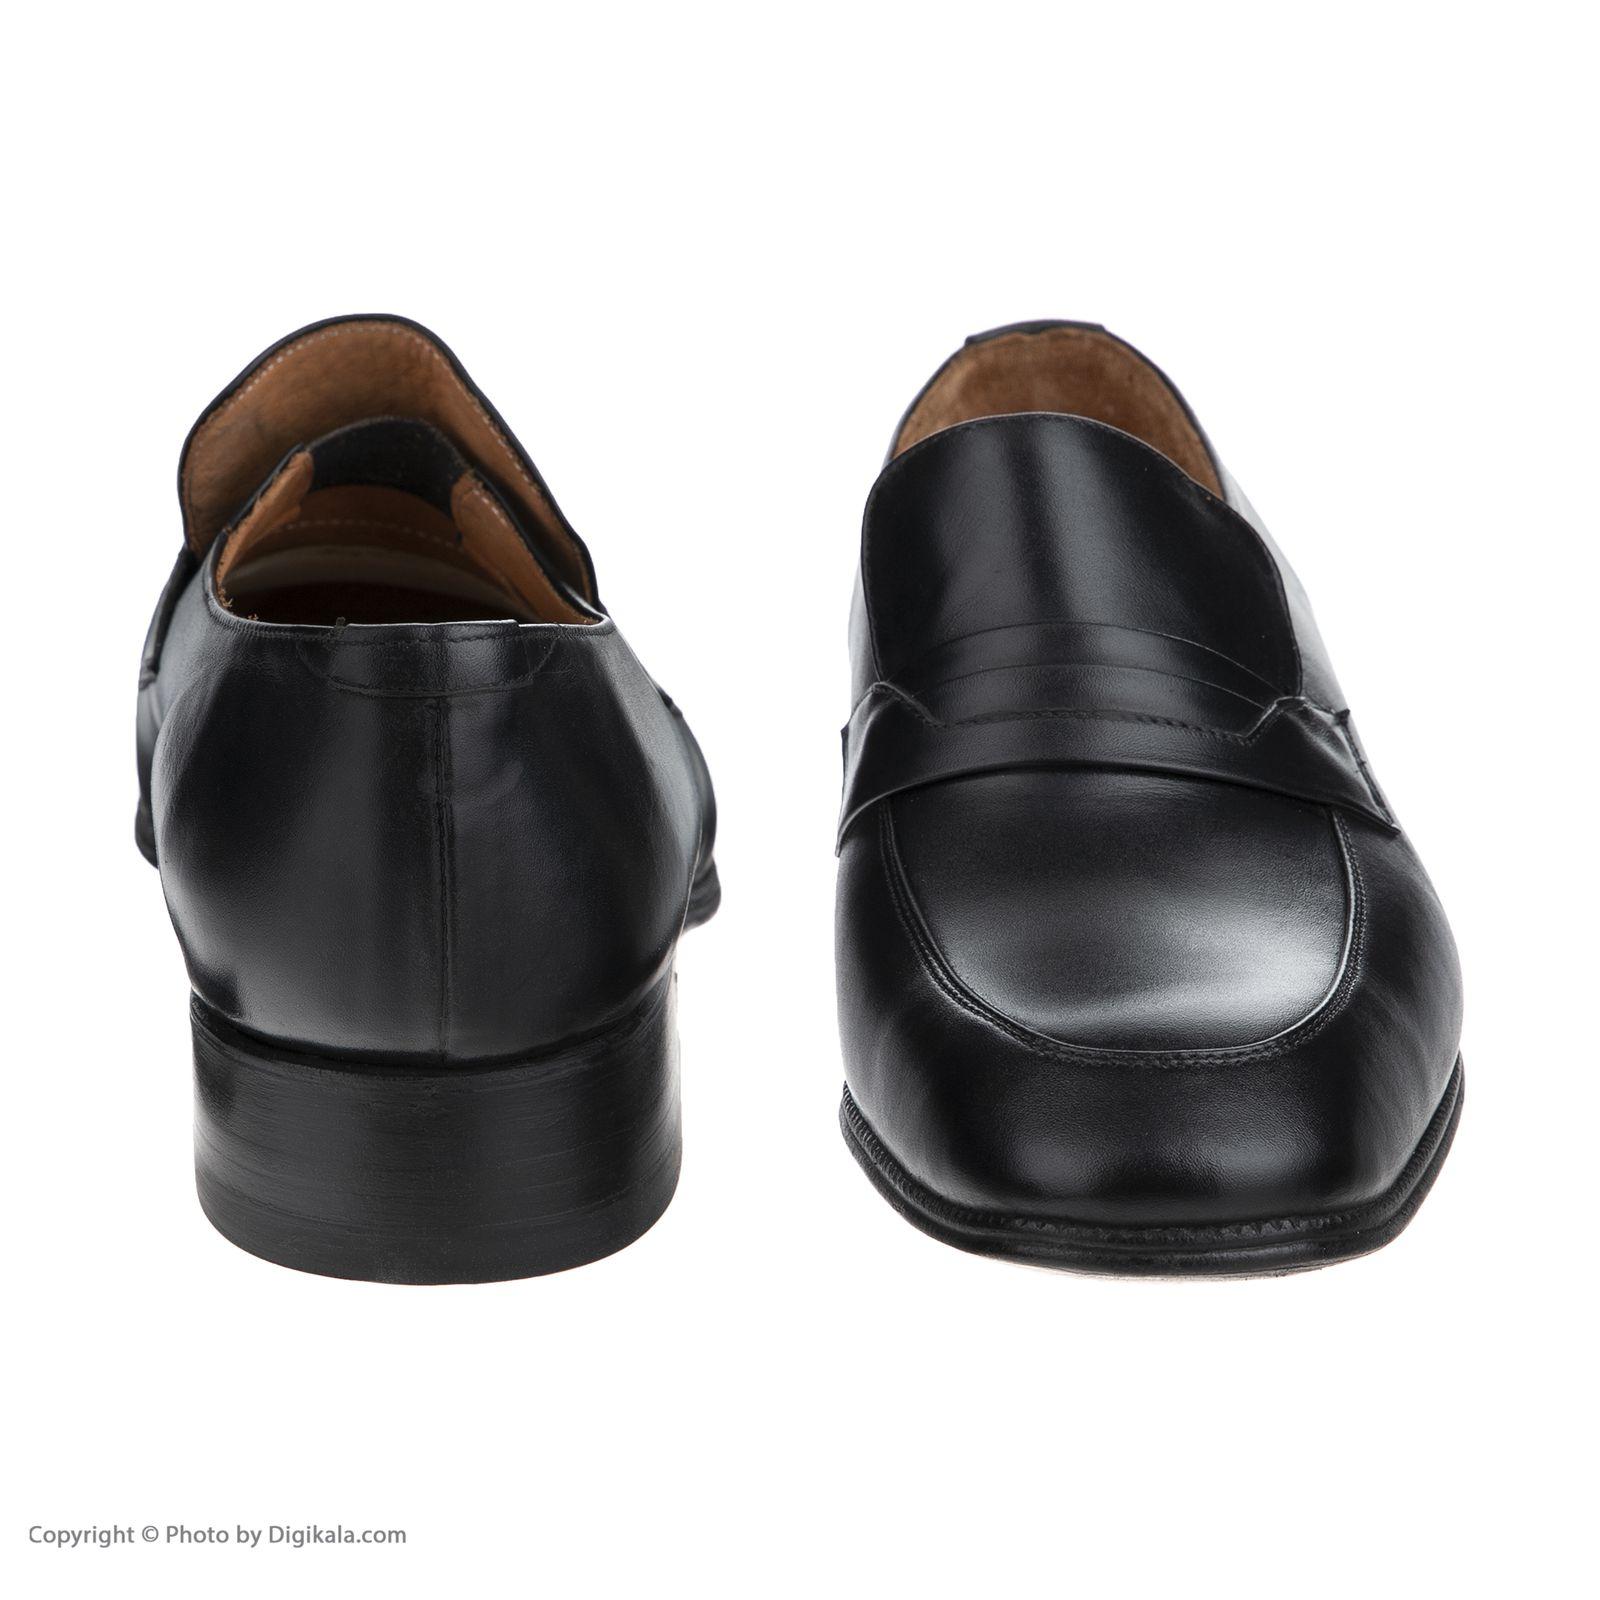 کفش مردانه نظری کد 416 -  - 5